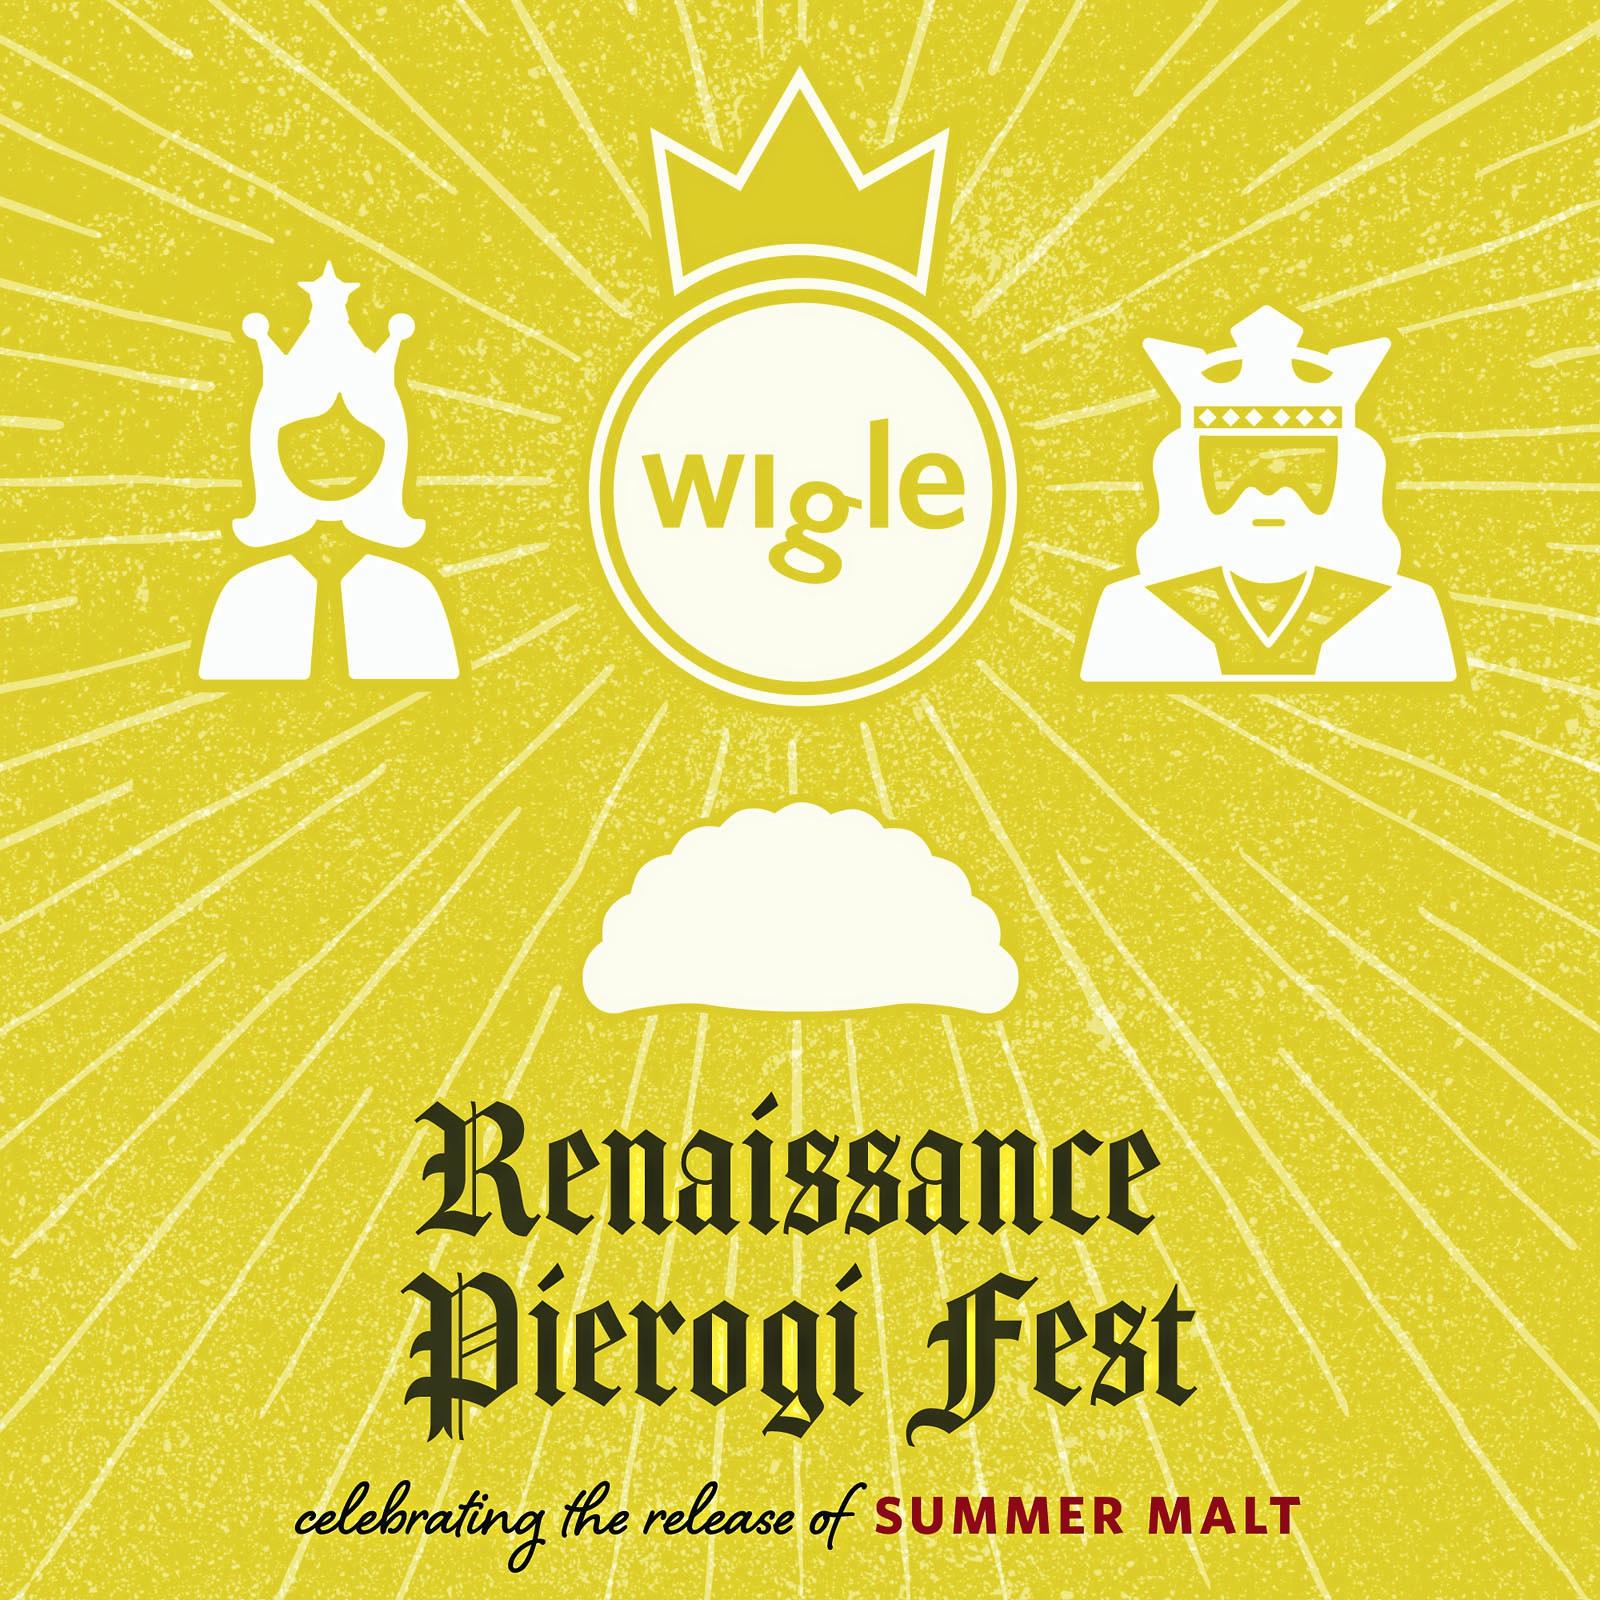 logo wigle renaissance pierogi fest Wigle Renaissance Perrogi Fest logo